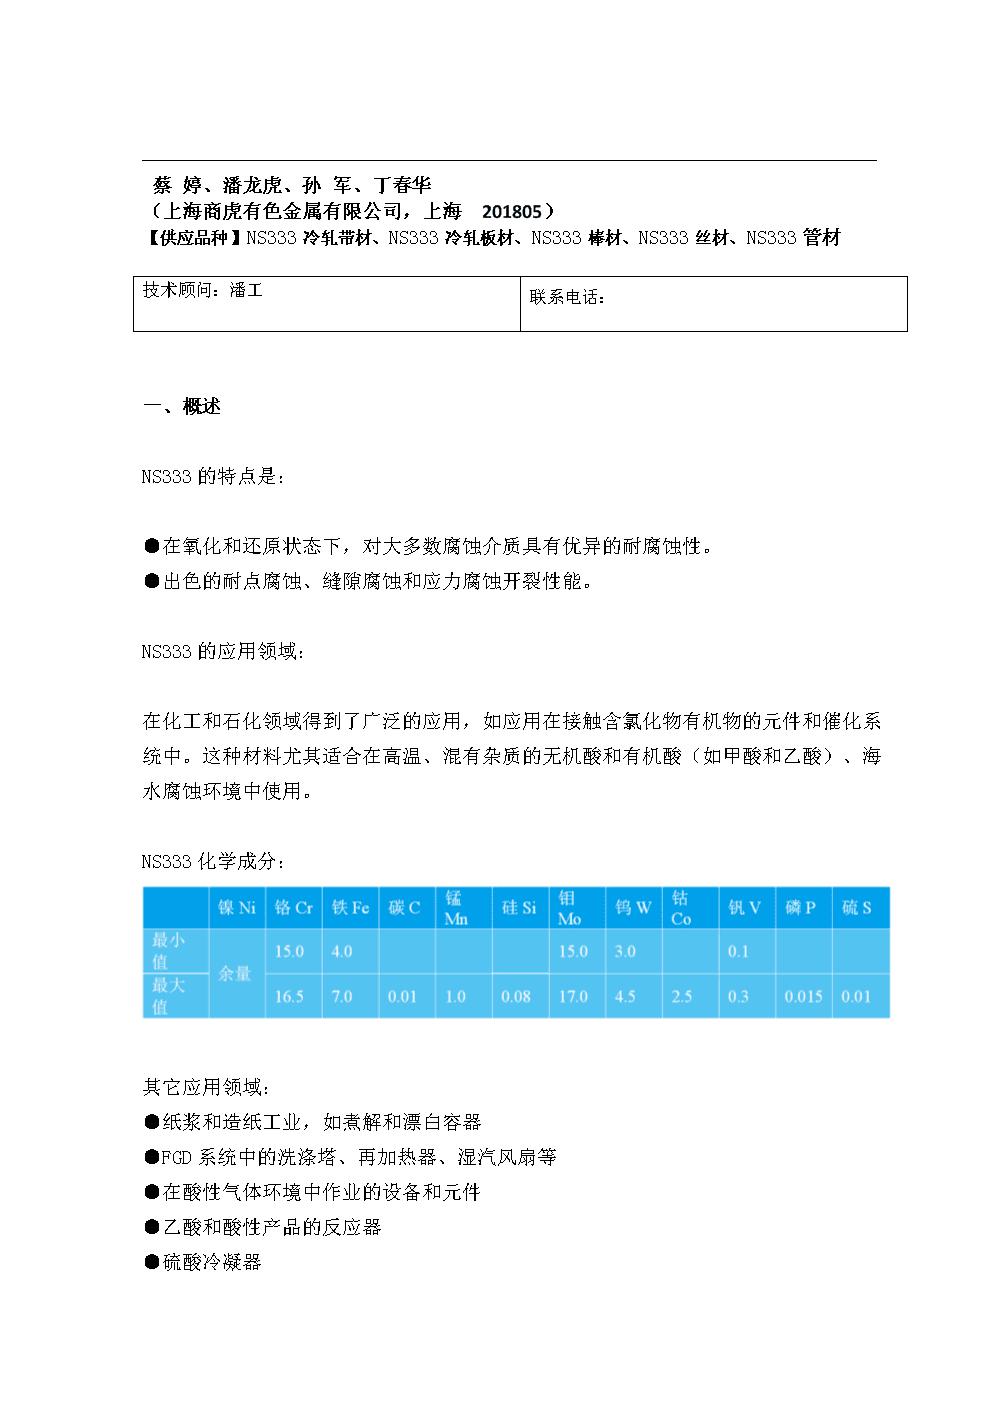 NS333-上海商虎合金技术.doc